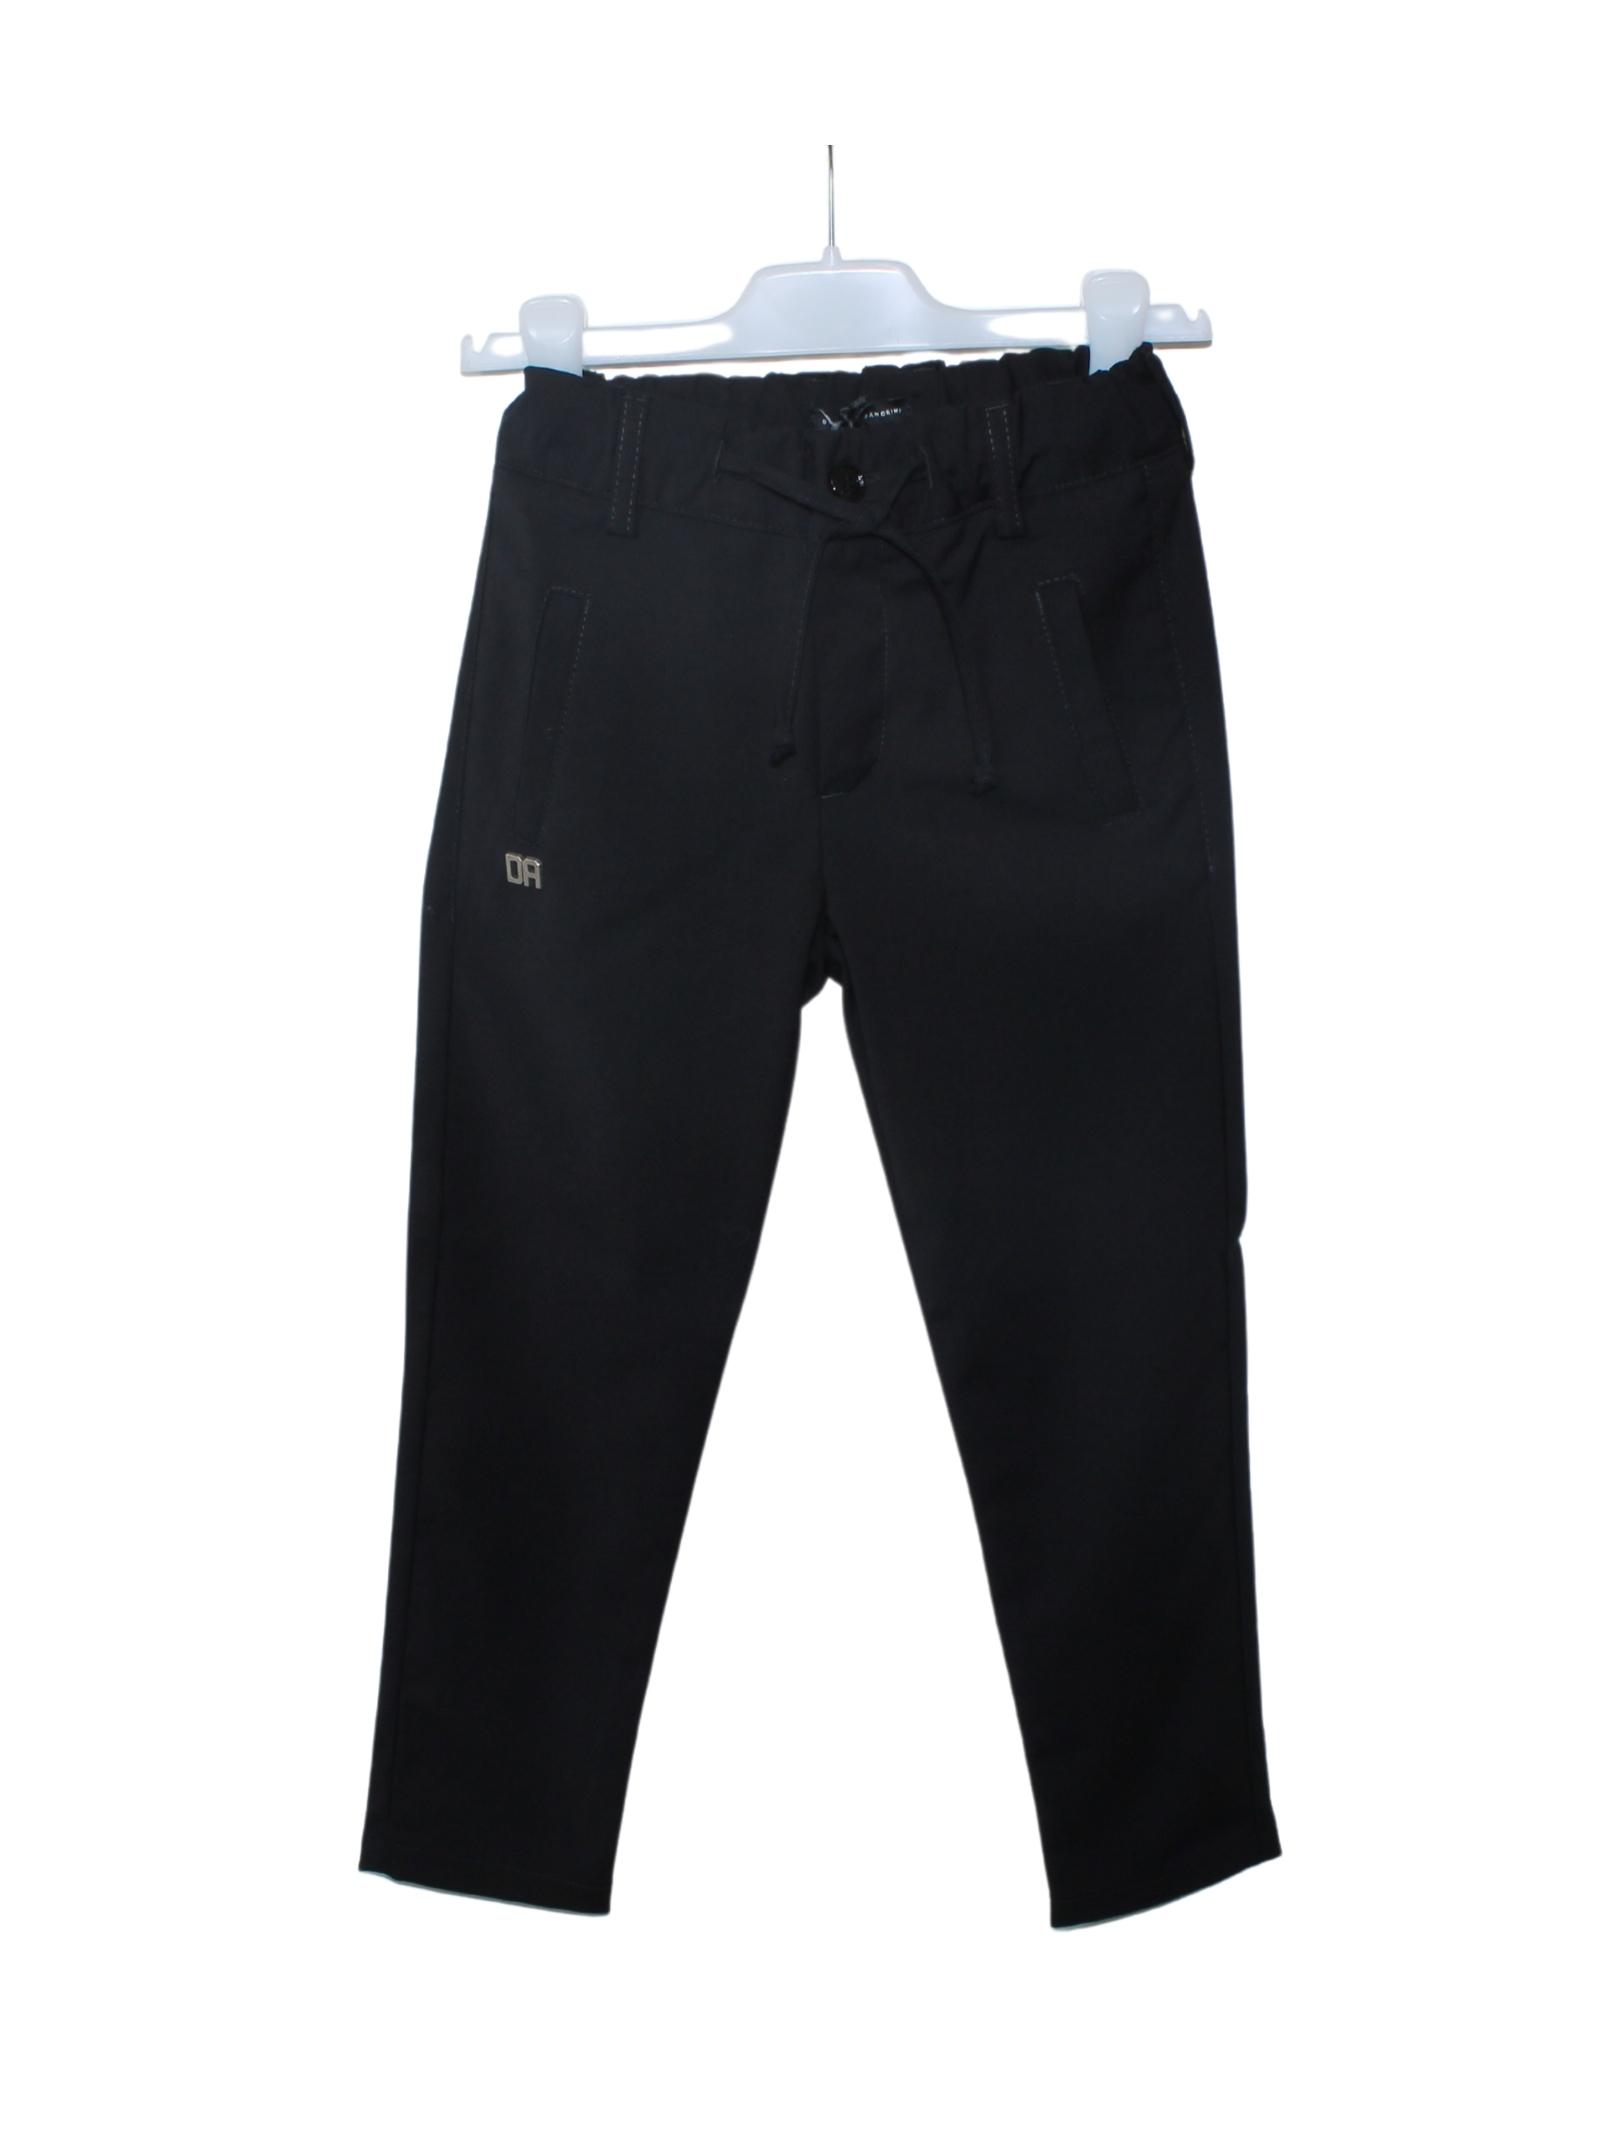 Pantalone Bambino Black DANIELE ALESSANDRINI JUNIOR | Pantaloni | 1235P0833NERO